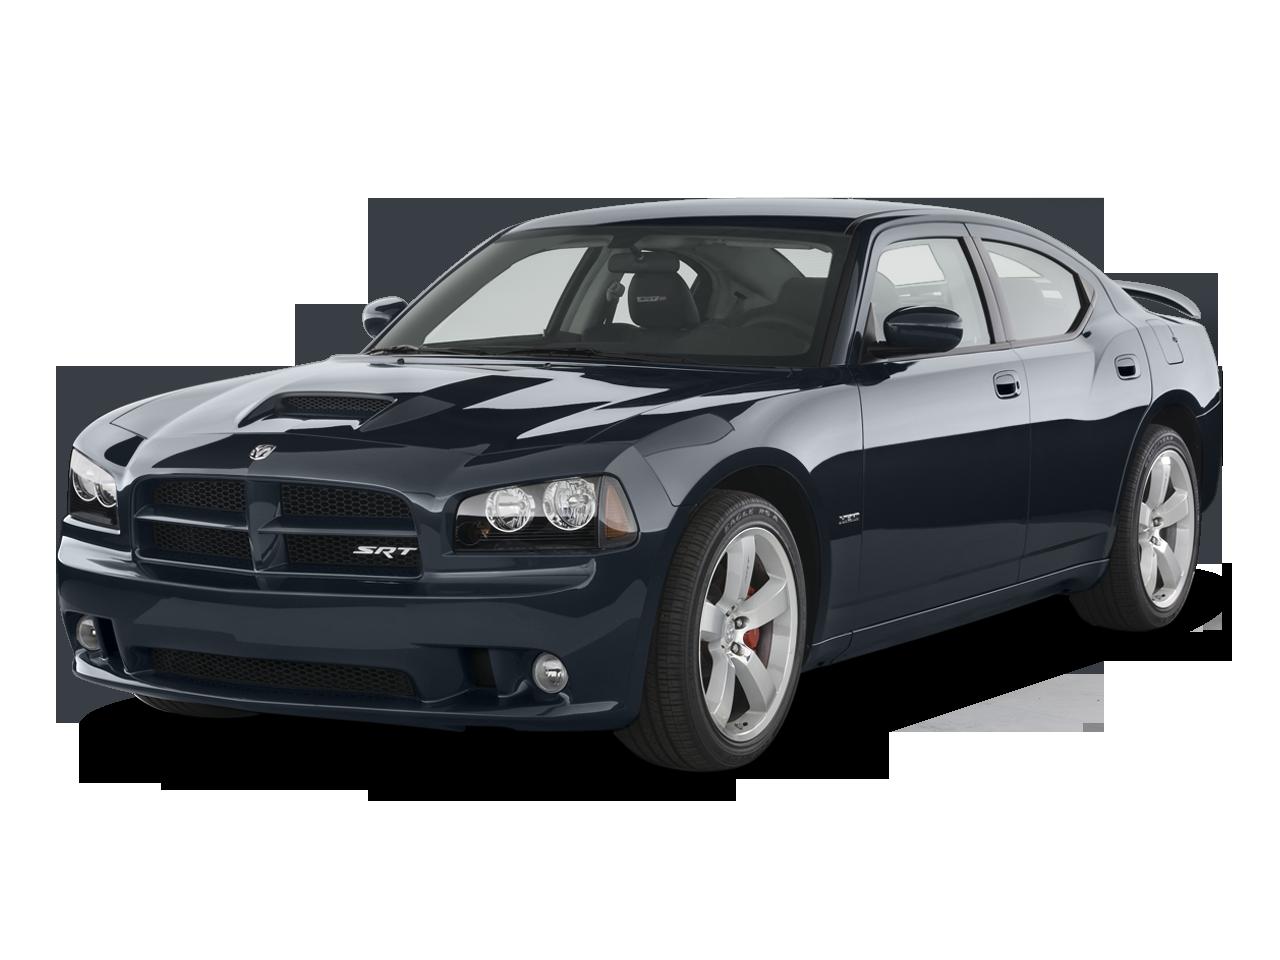 2010 Dodge Charger SRT8 - Dodge Sports Coupe Review - Automobile ...